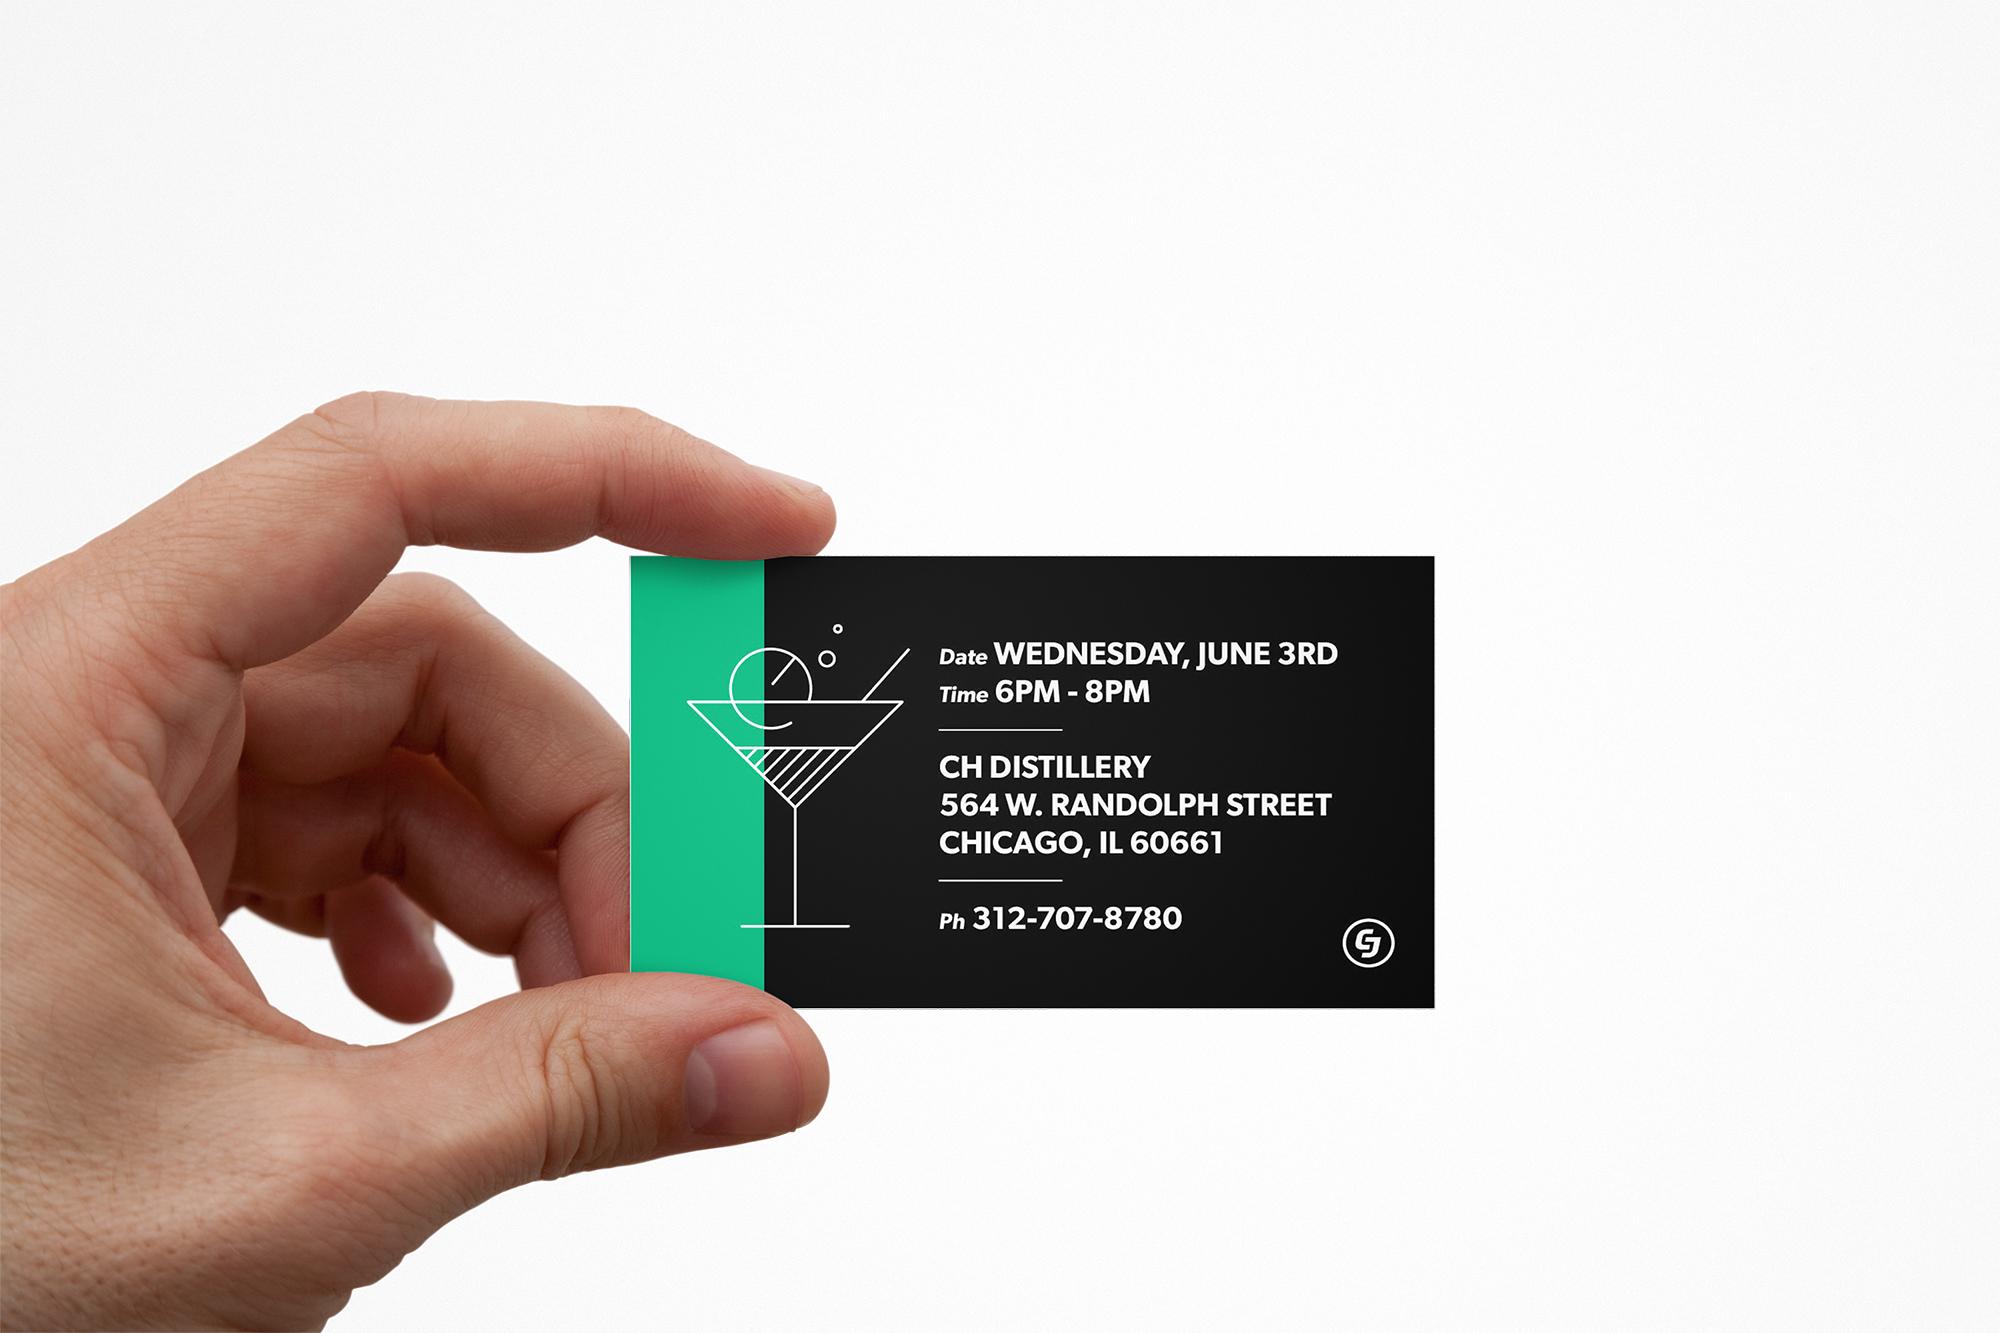 CJ_Invitation 2015-06-01 Back_small.jpg